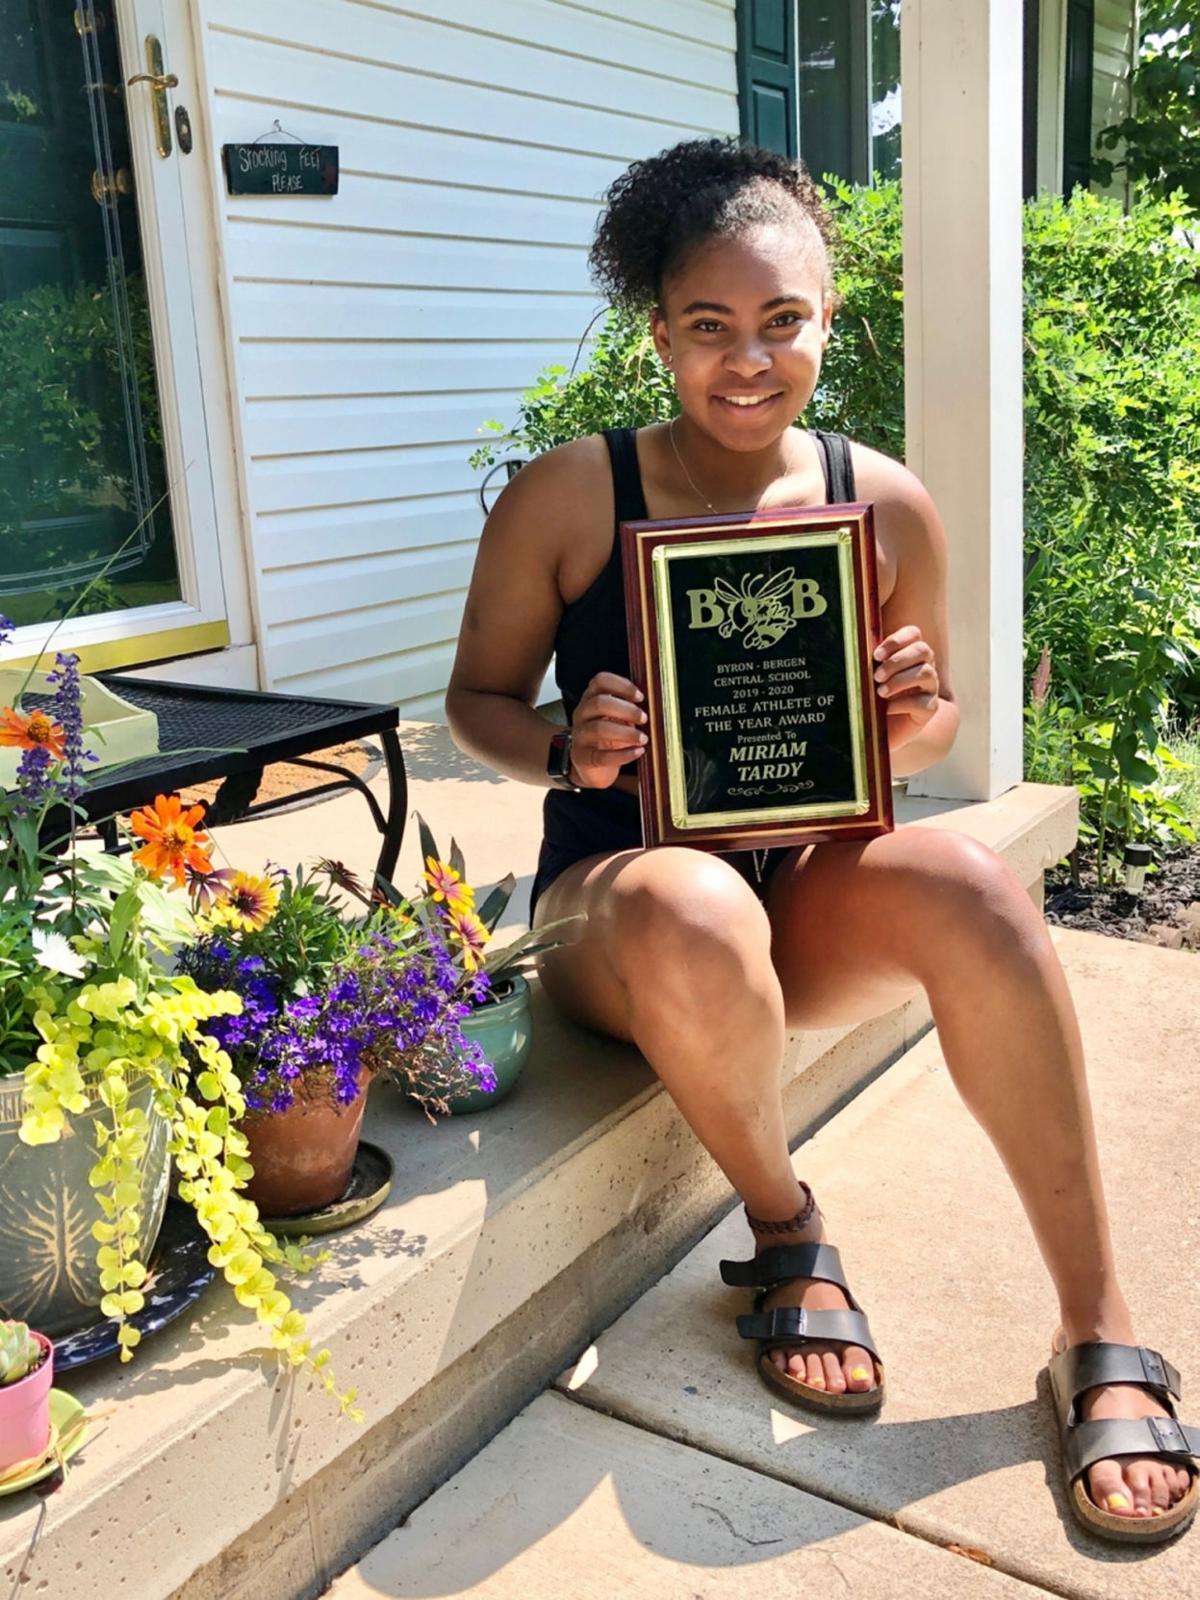 BB's, Tardy, OA's Rykert earn GR's highest honor